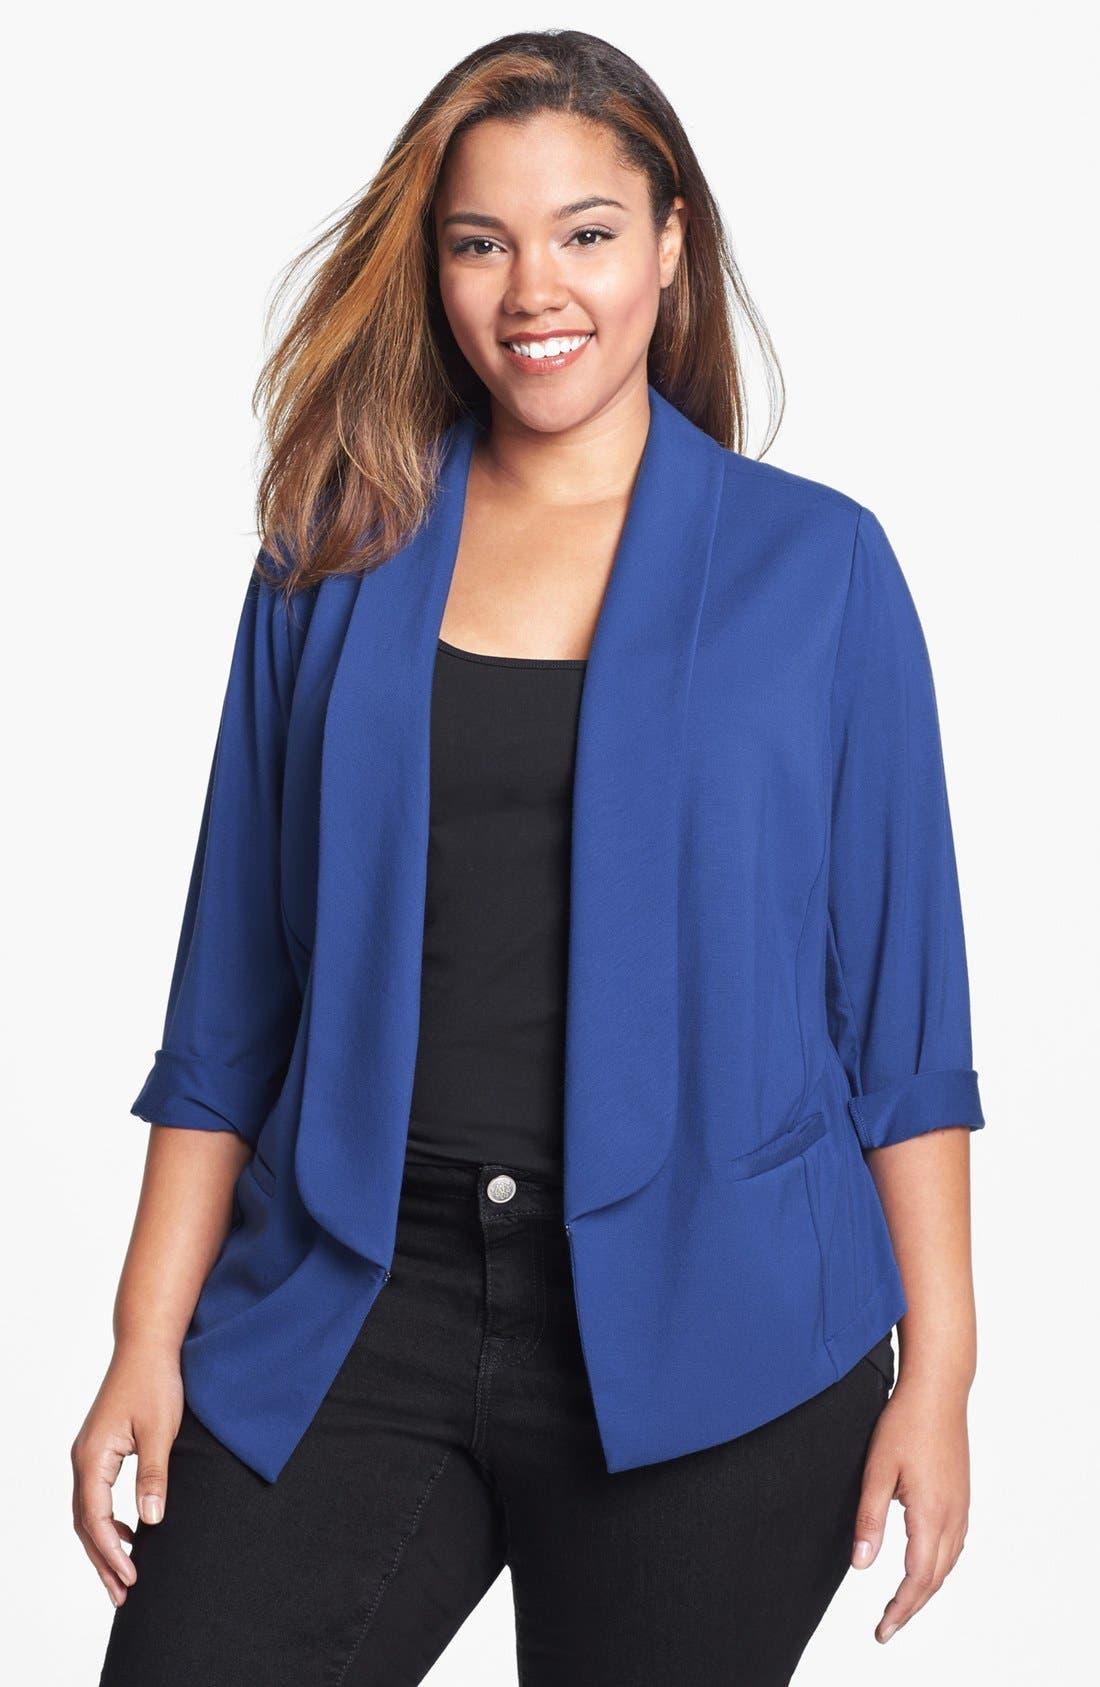 Alternate Image 1 Selected - Sejour 'Siro' Shawl Collar Jacket (Plus Size)